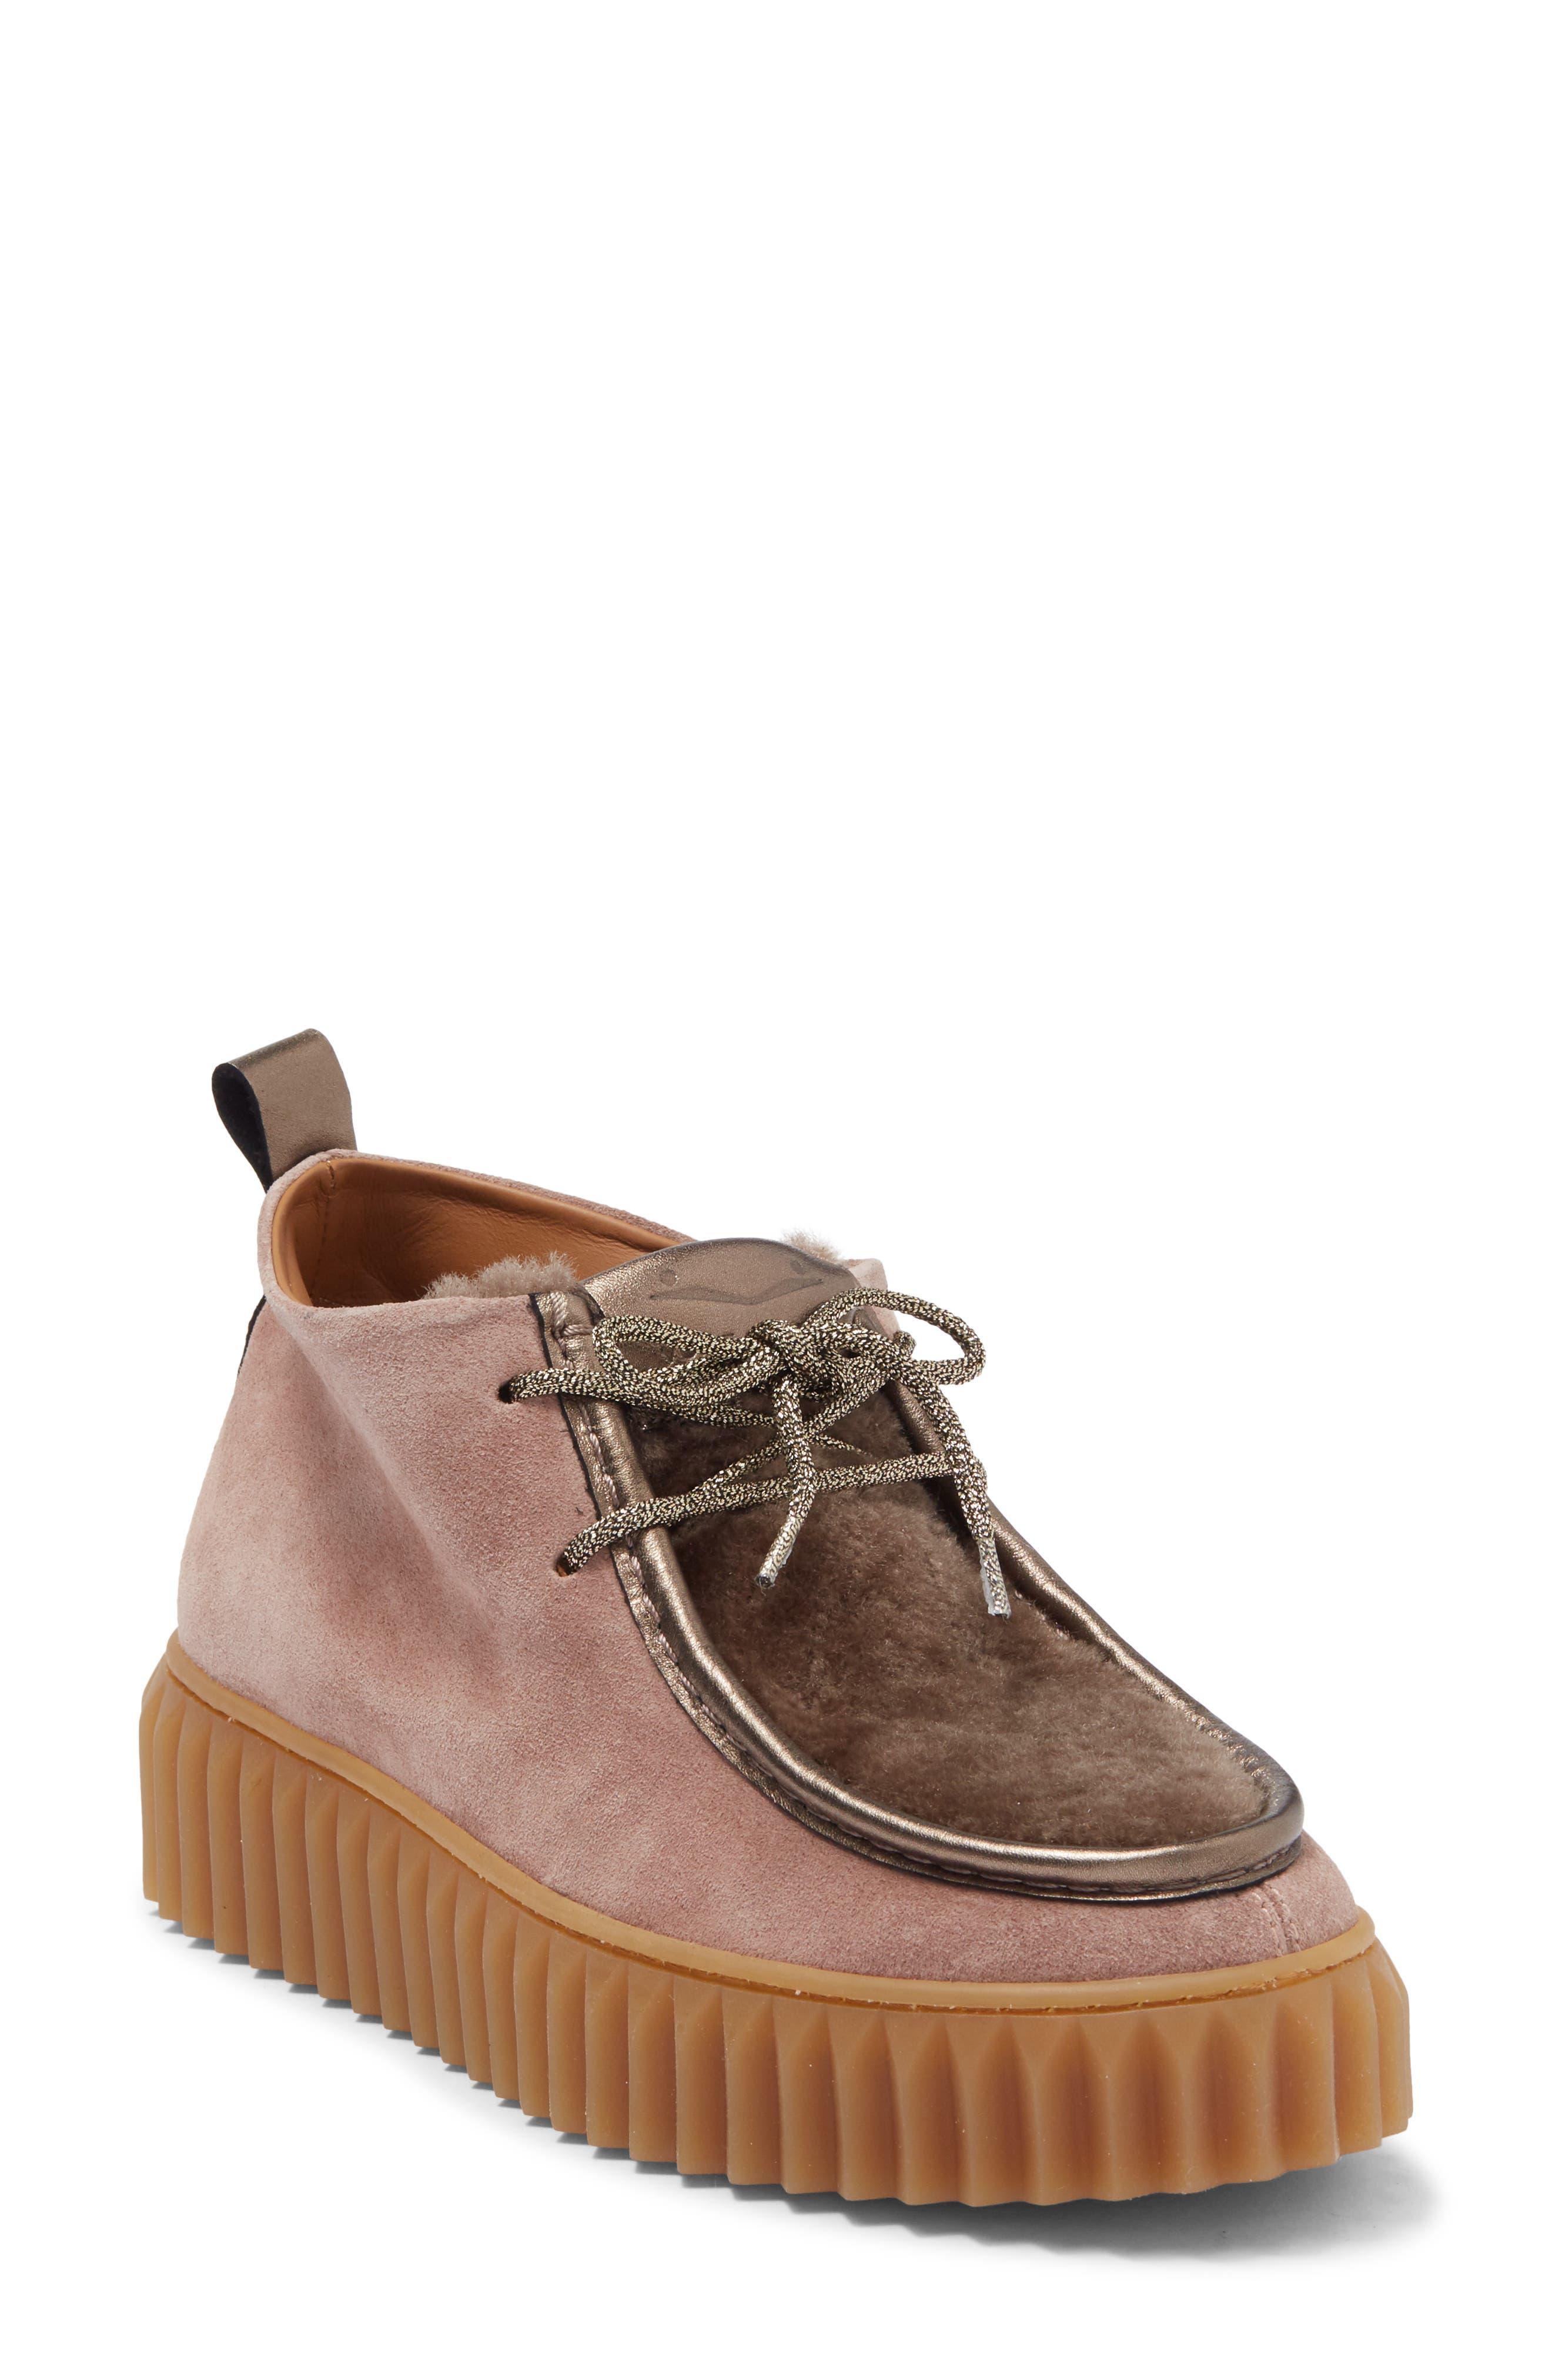 Image of Viola Blanche Penelope Platform Suede Sneaker